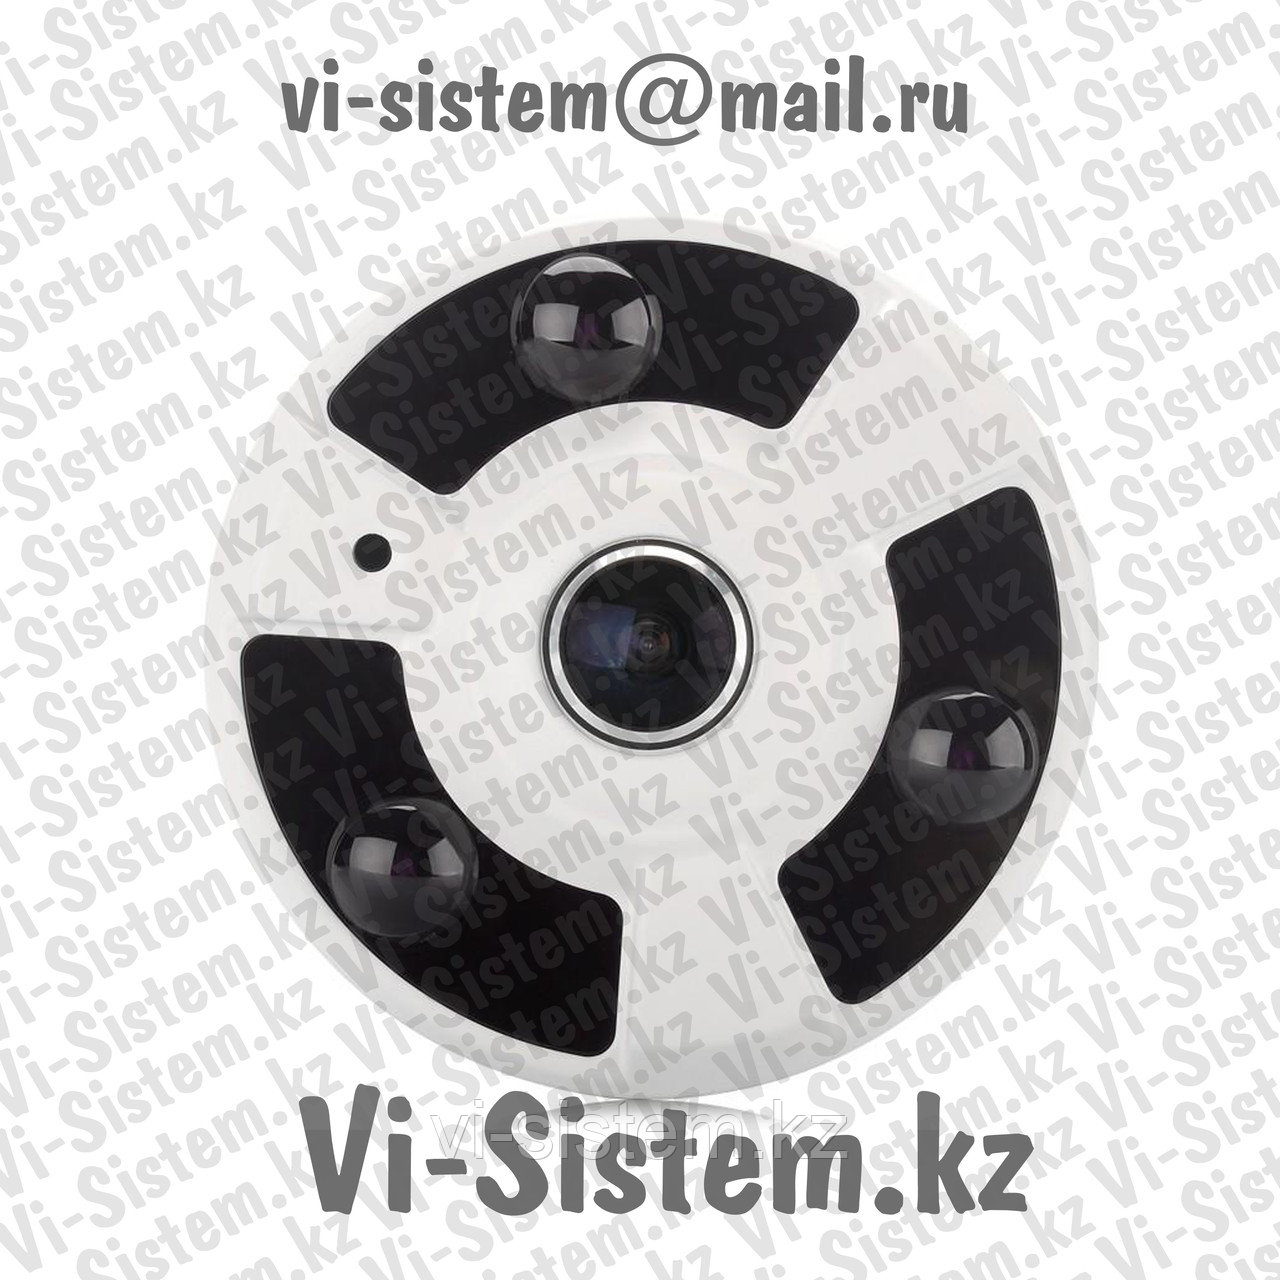 IP-Видеокамера SYNQAR SY-002 2MP Рыбий глаз